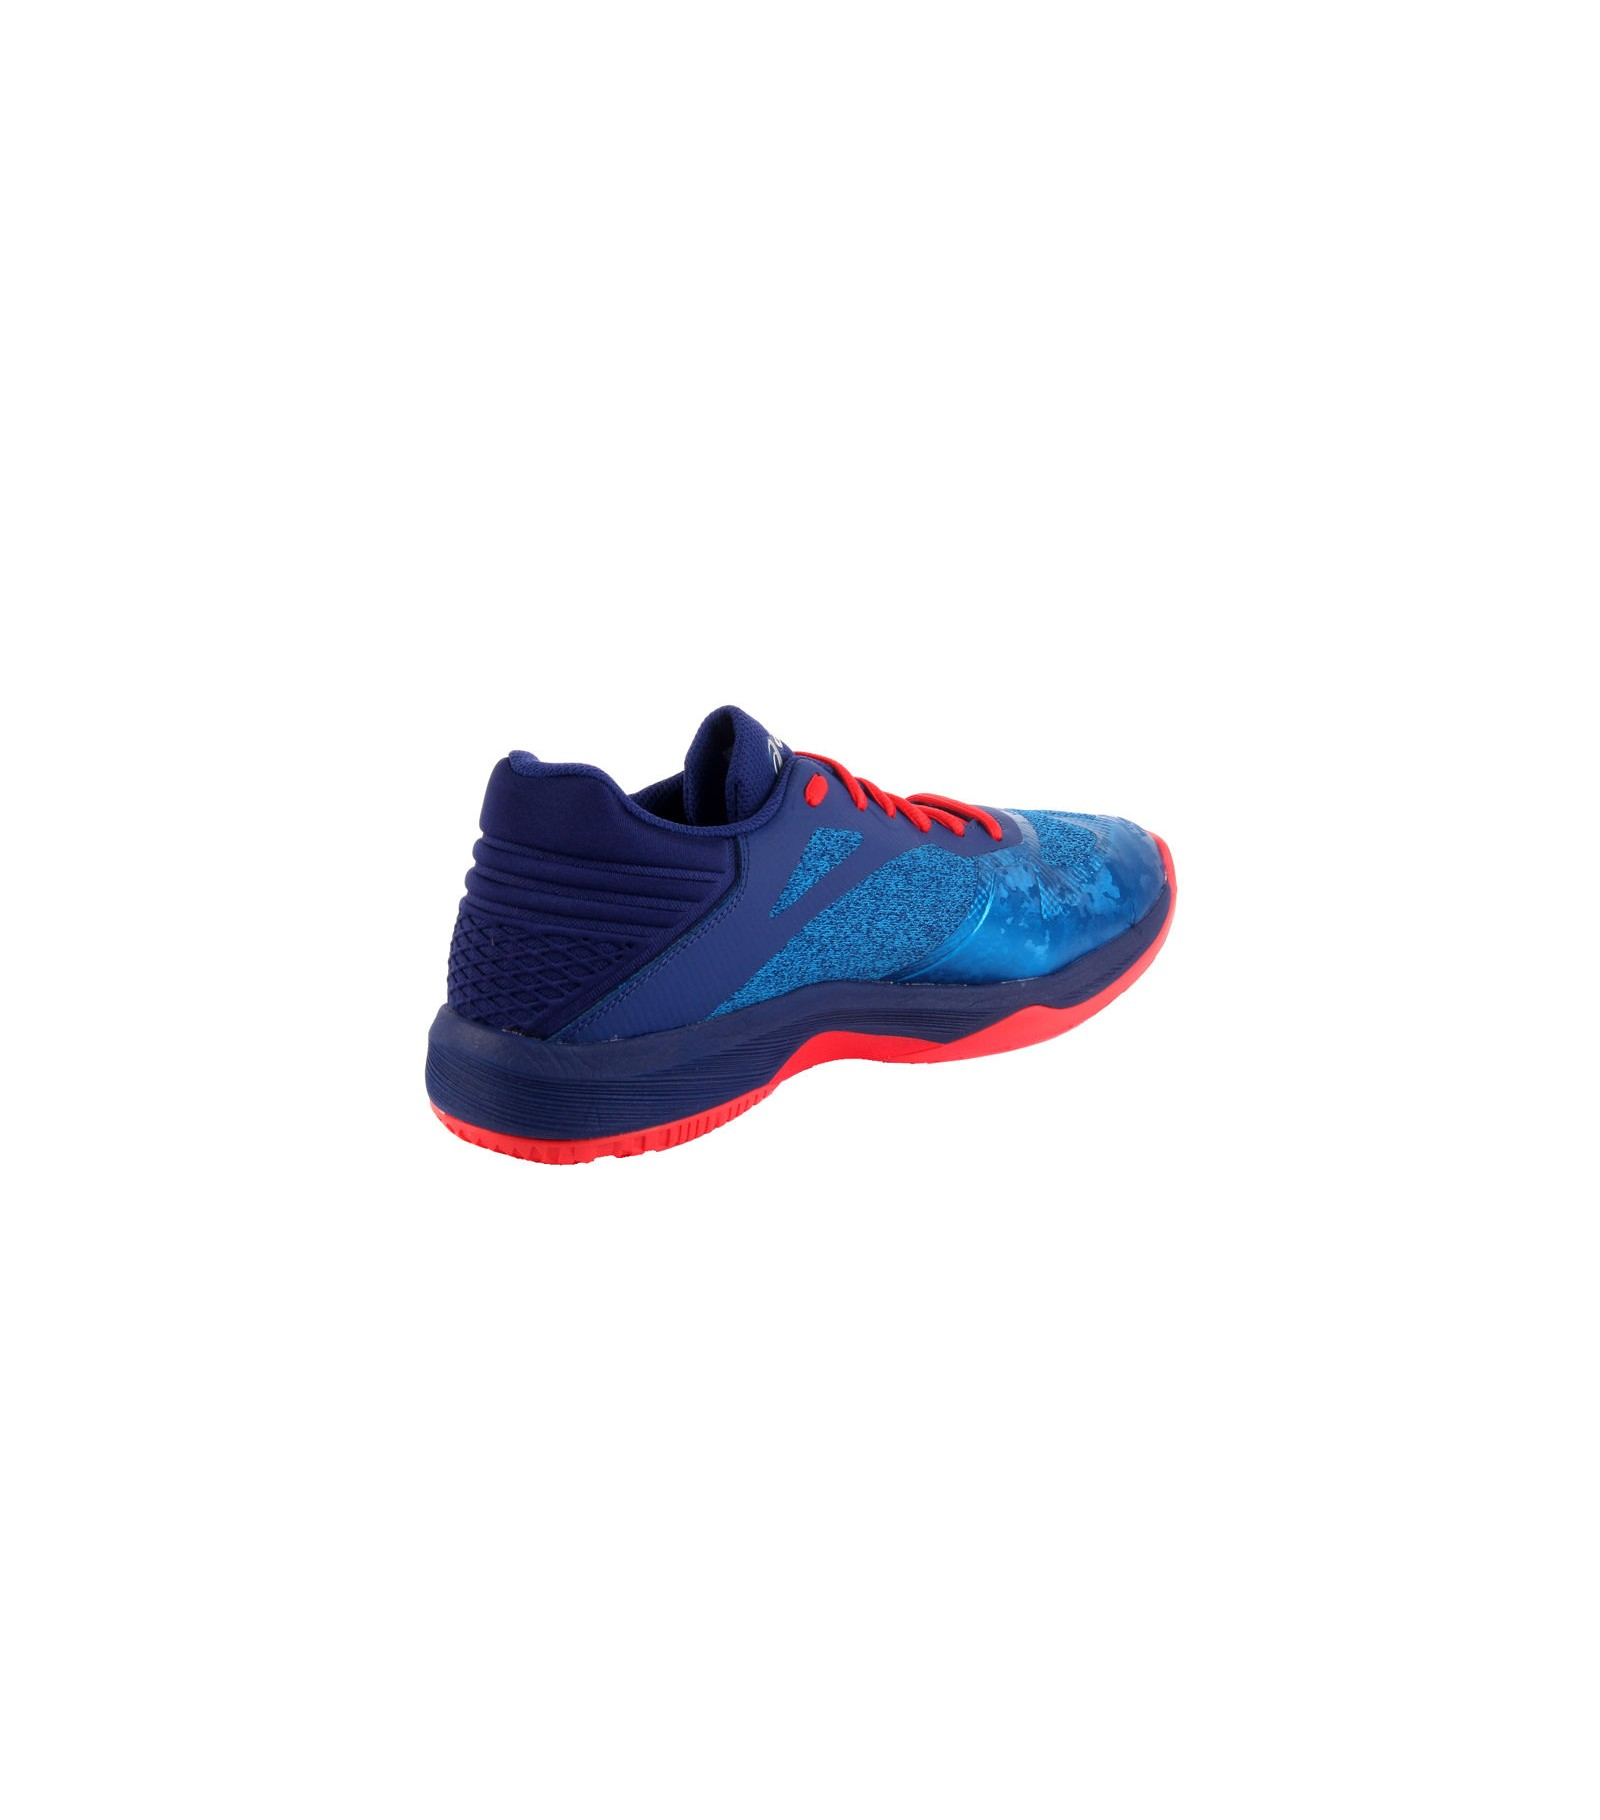 Details about Asics Gel Netburner Ballistic FF Scarpe volley donna 1052A002 001*SPECIAL PRICE*